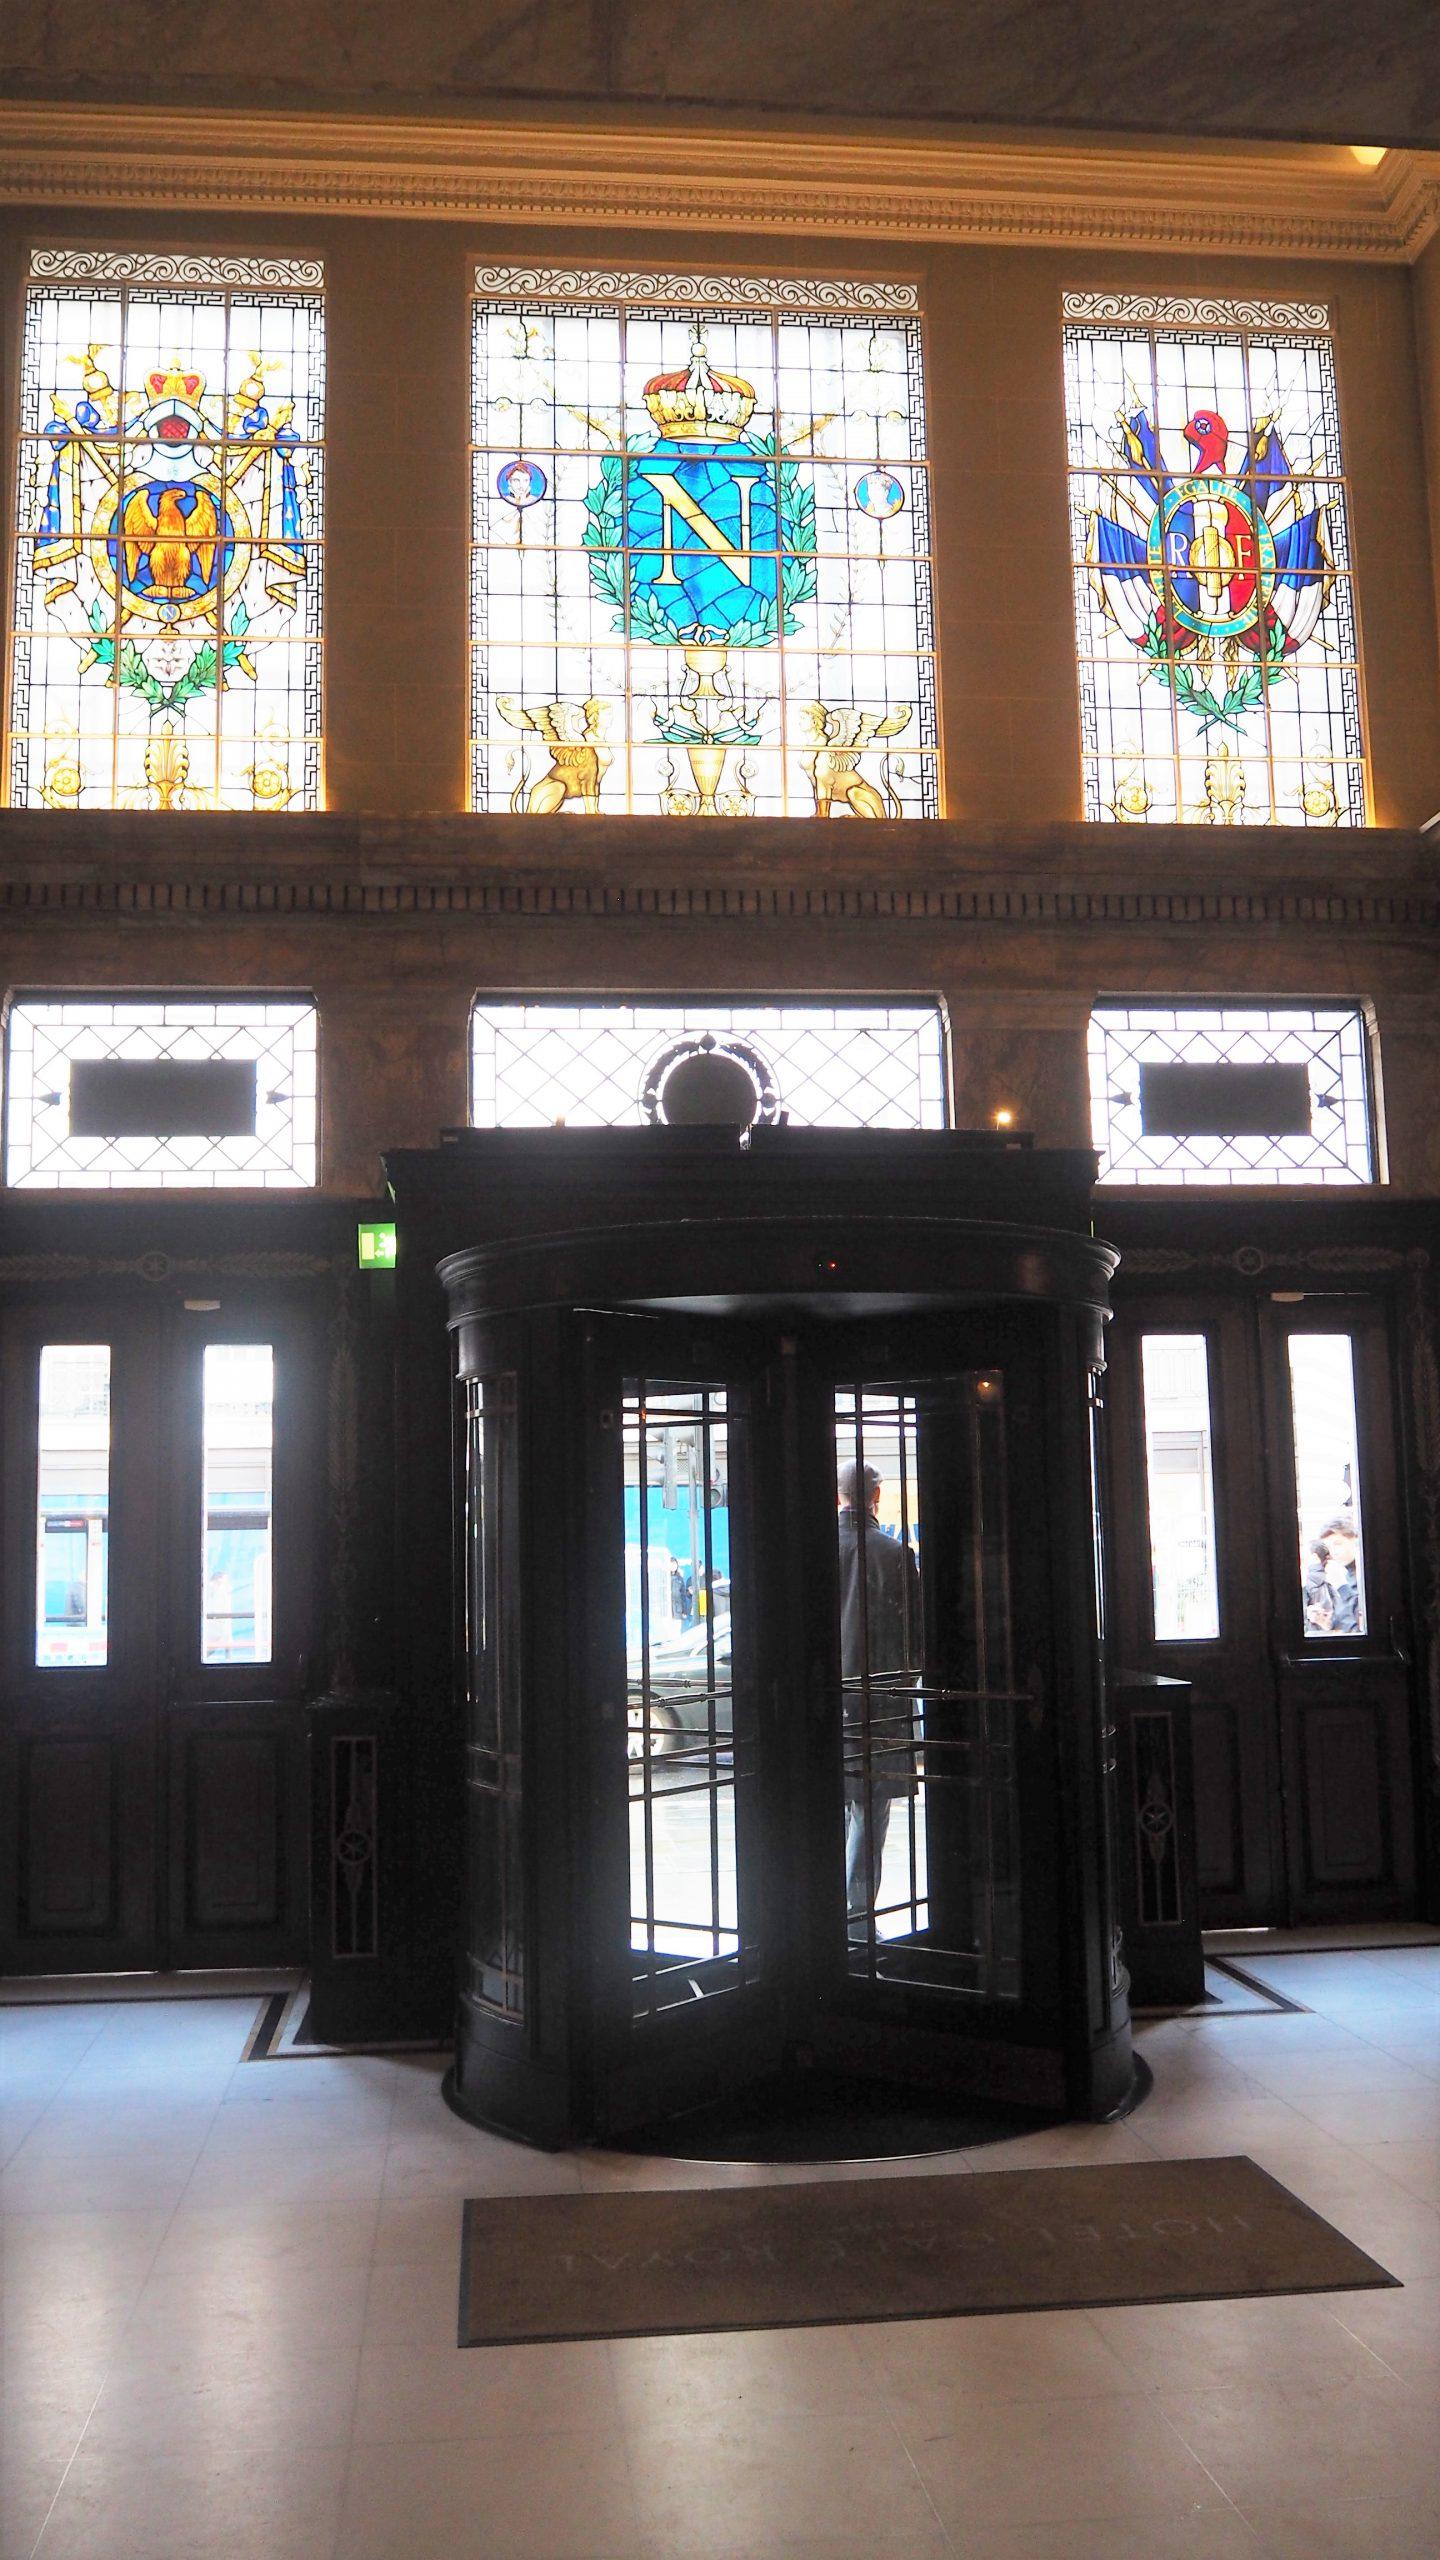 revolving doors of hotel cafe royal